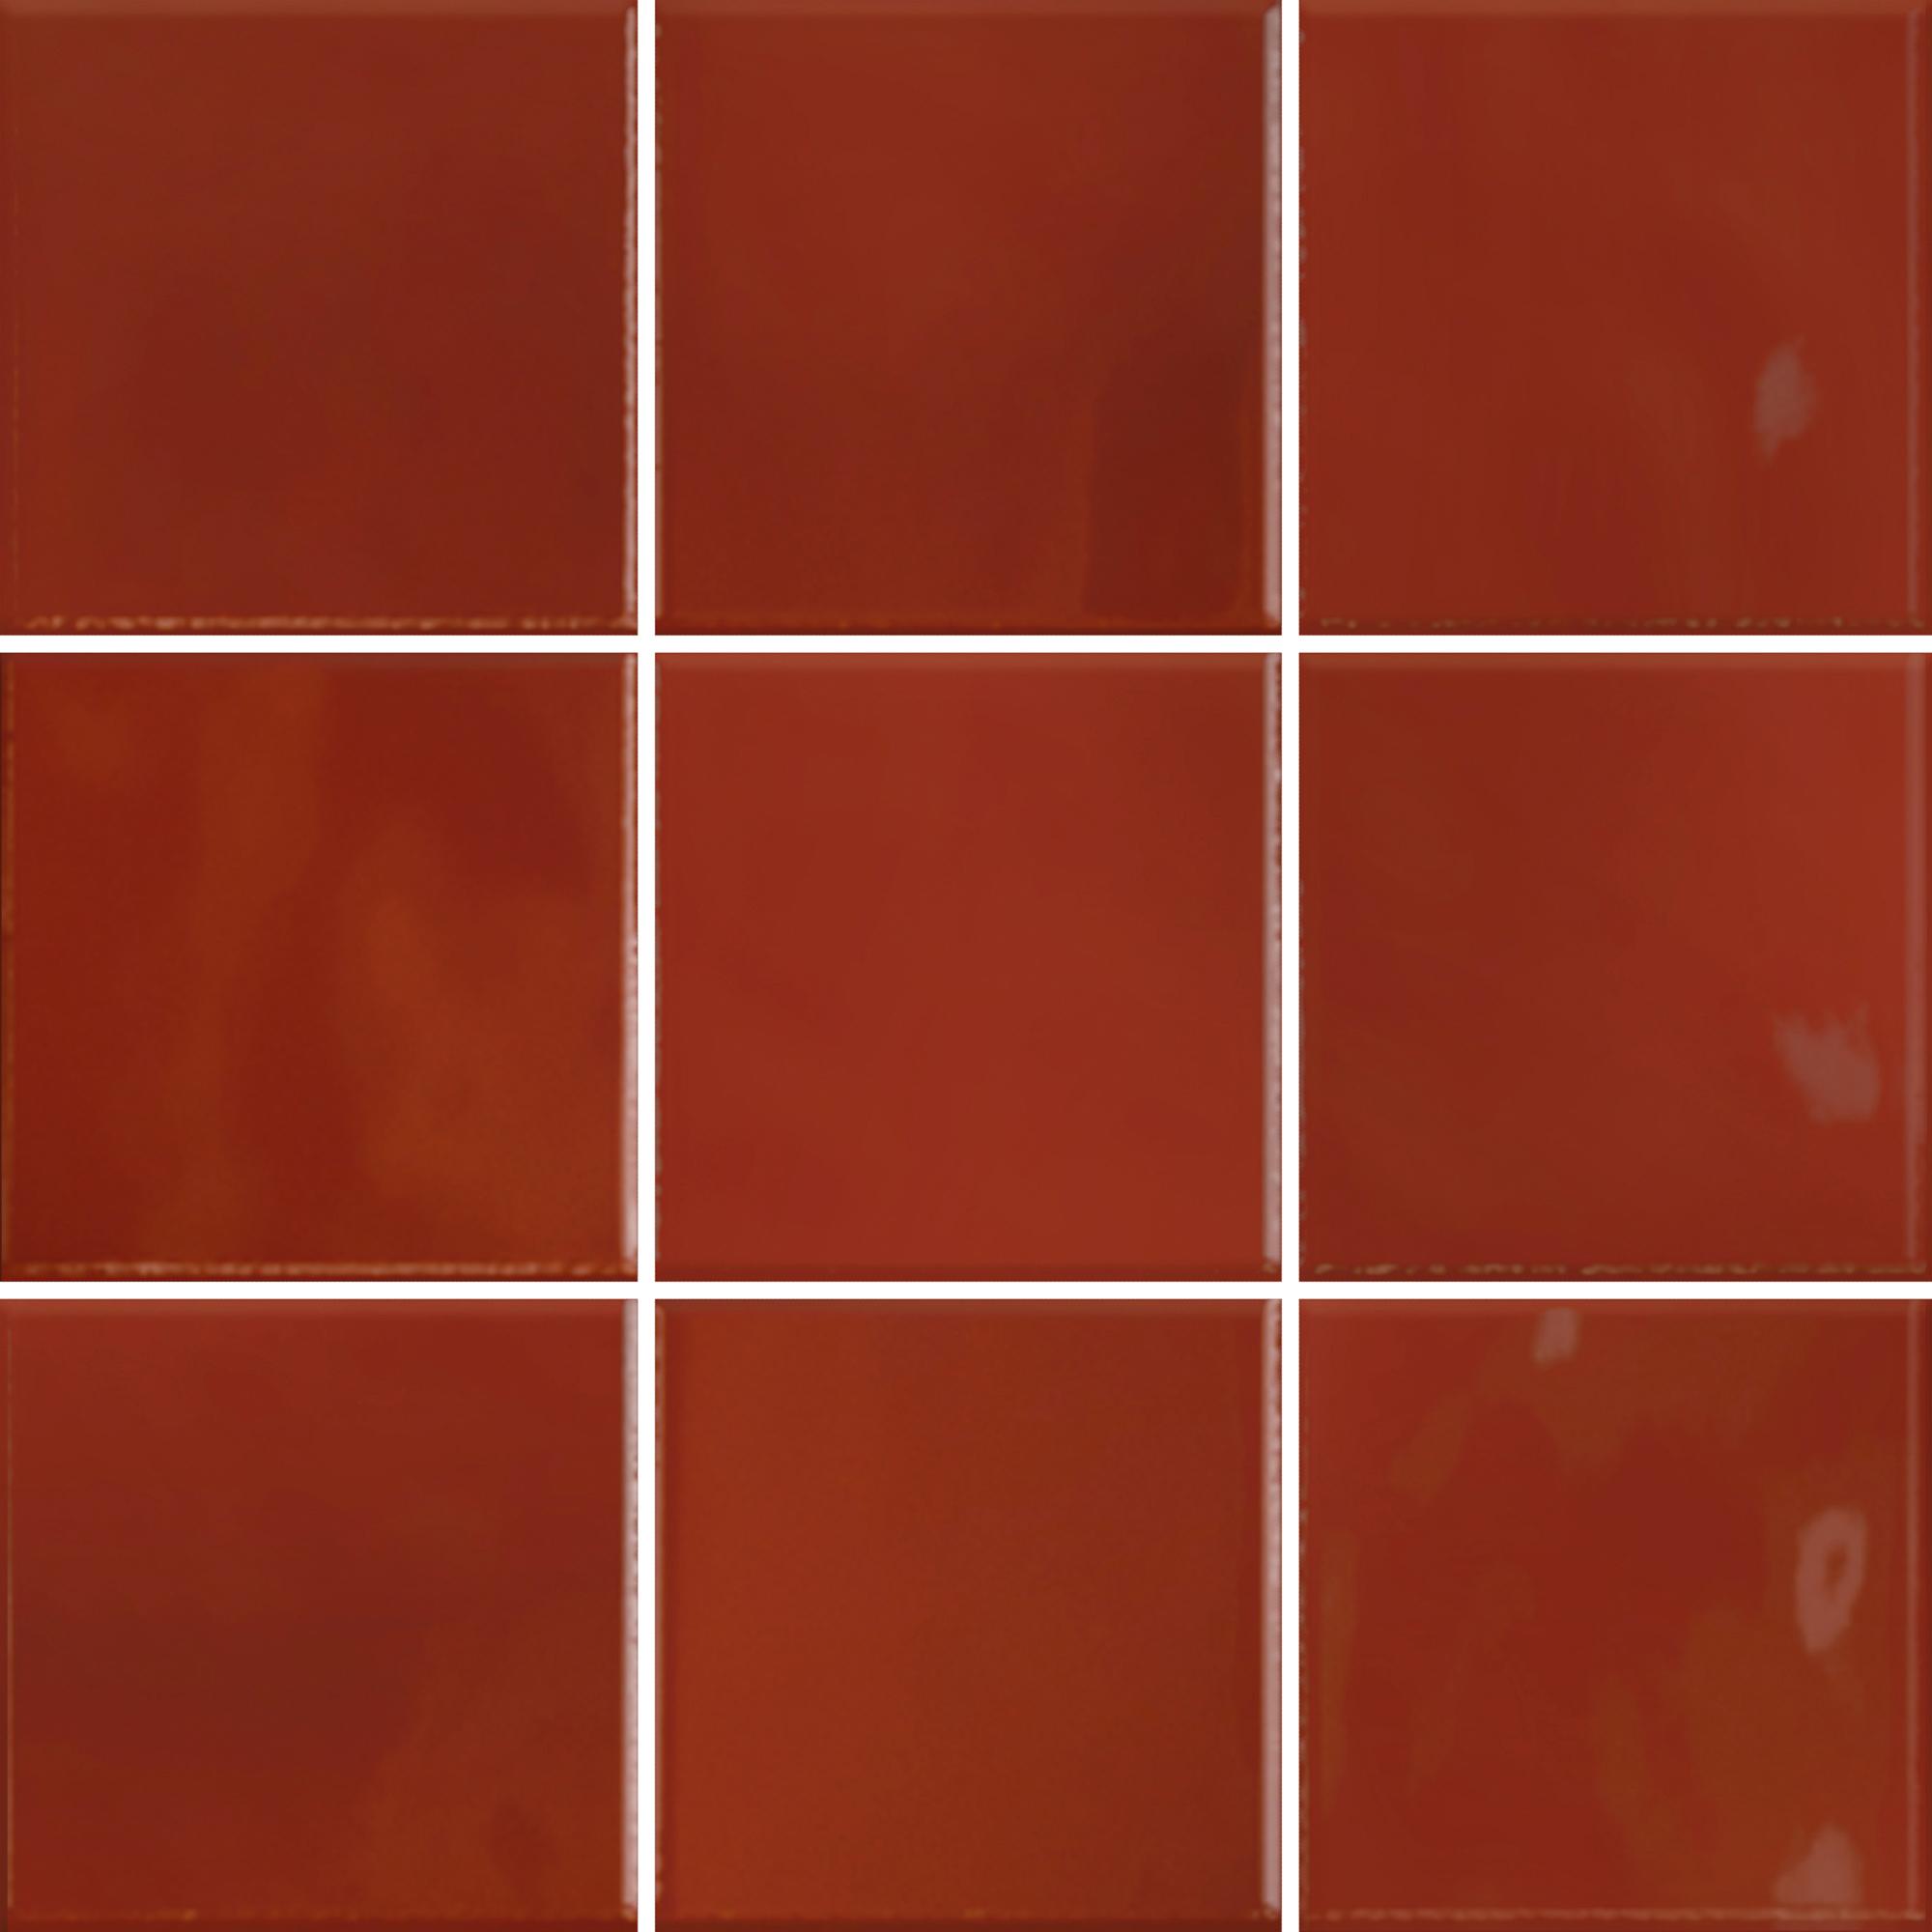 K94842580001VTE0, Retromix, Punainen, seina